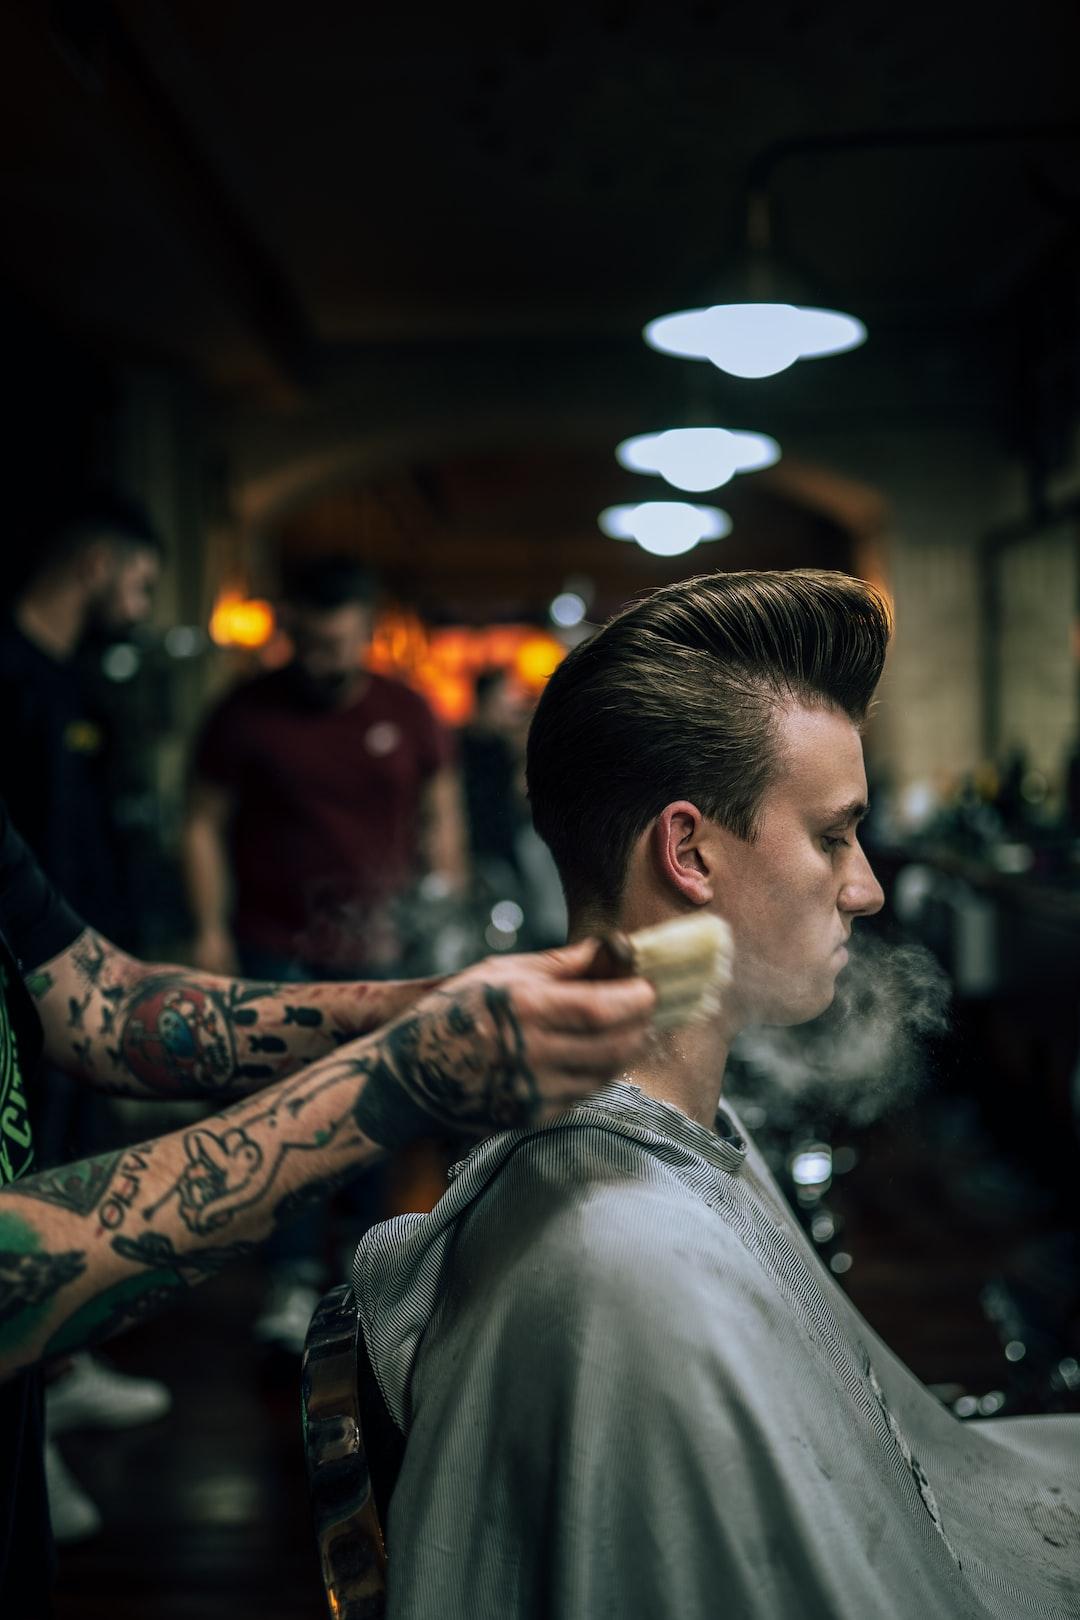 A barbershop Photographer vision. Shoot on Sony A7III + Sigma 35mm 1.4